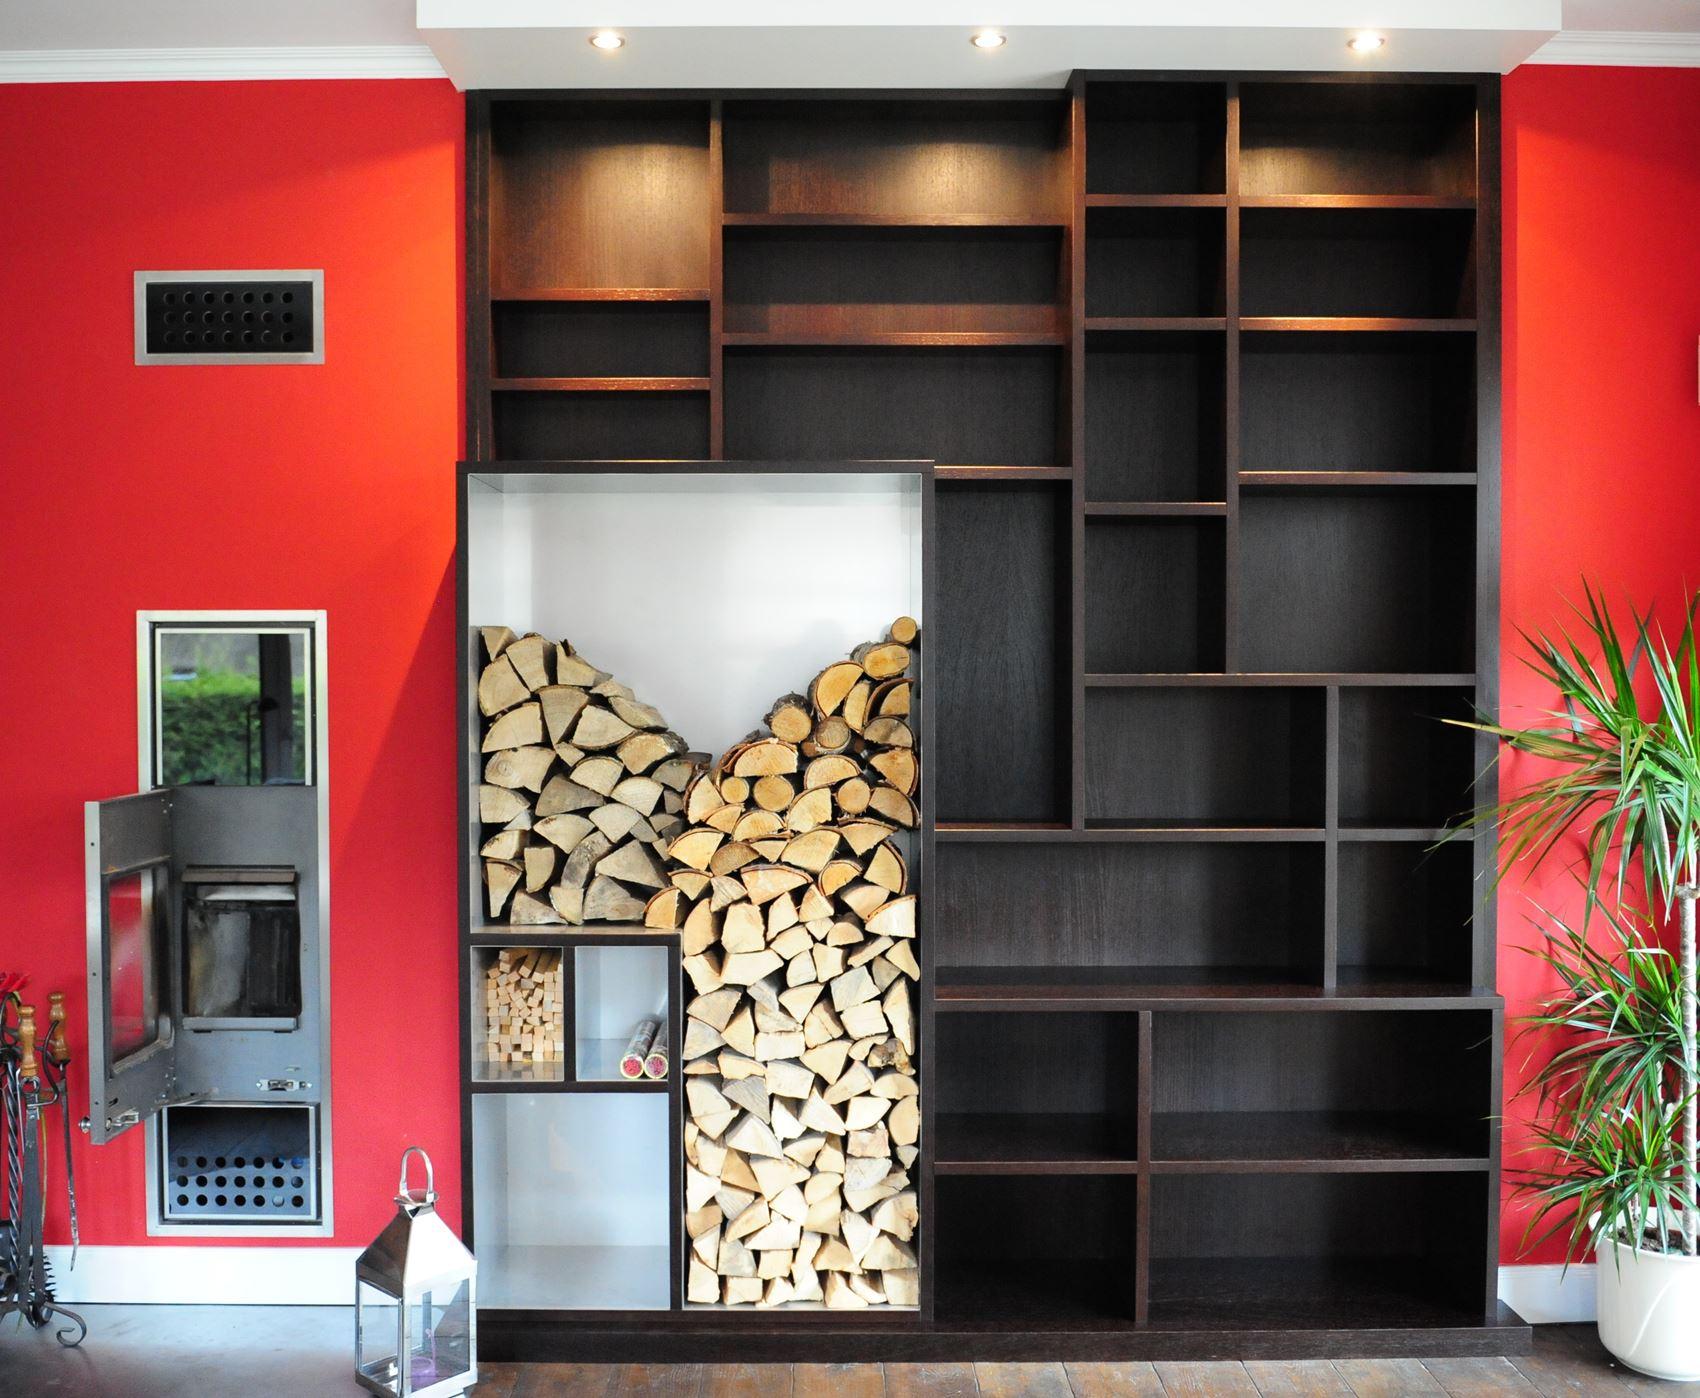 Kaminholz- und Bücherregal kombiniert